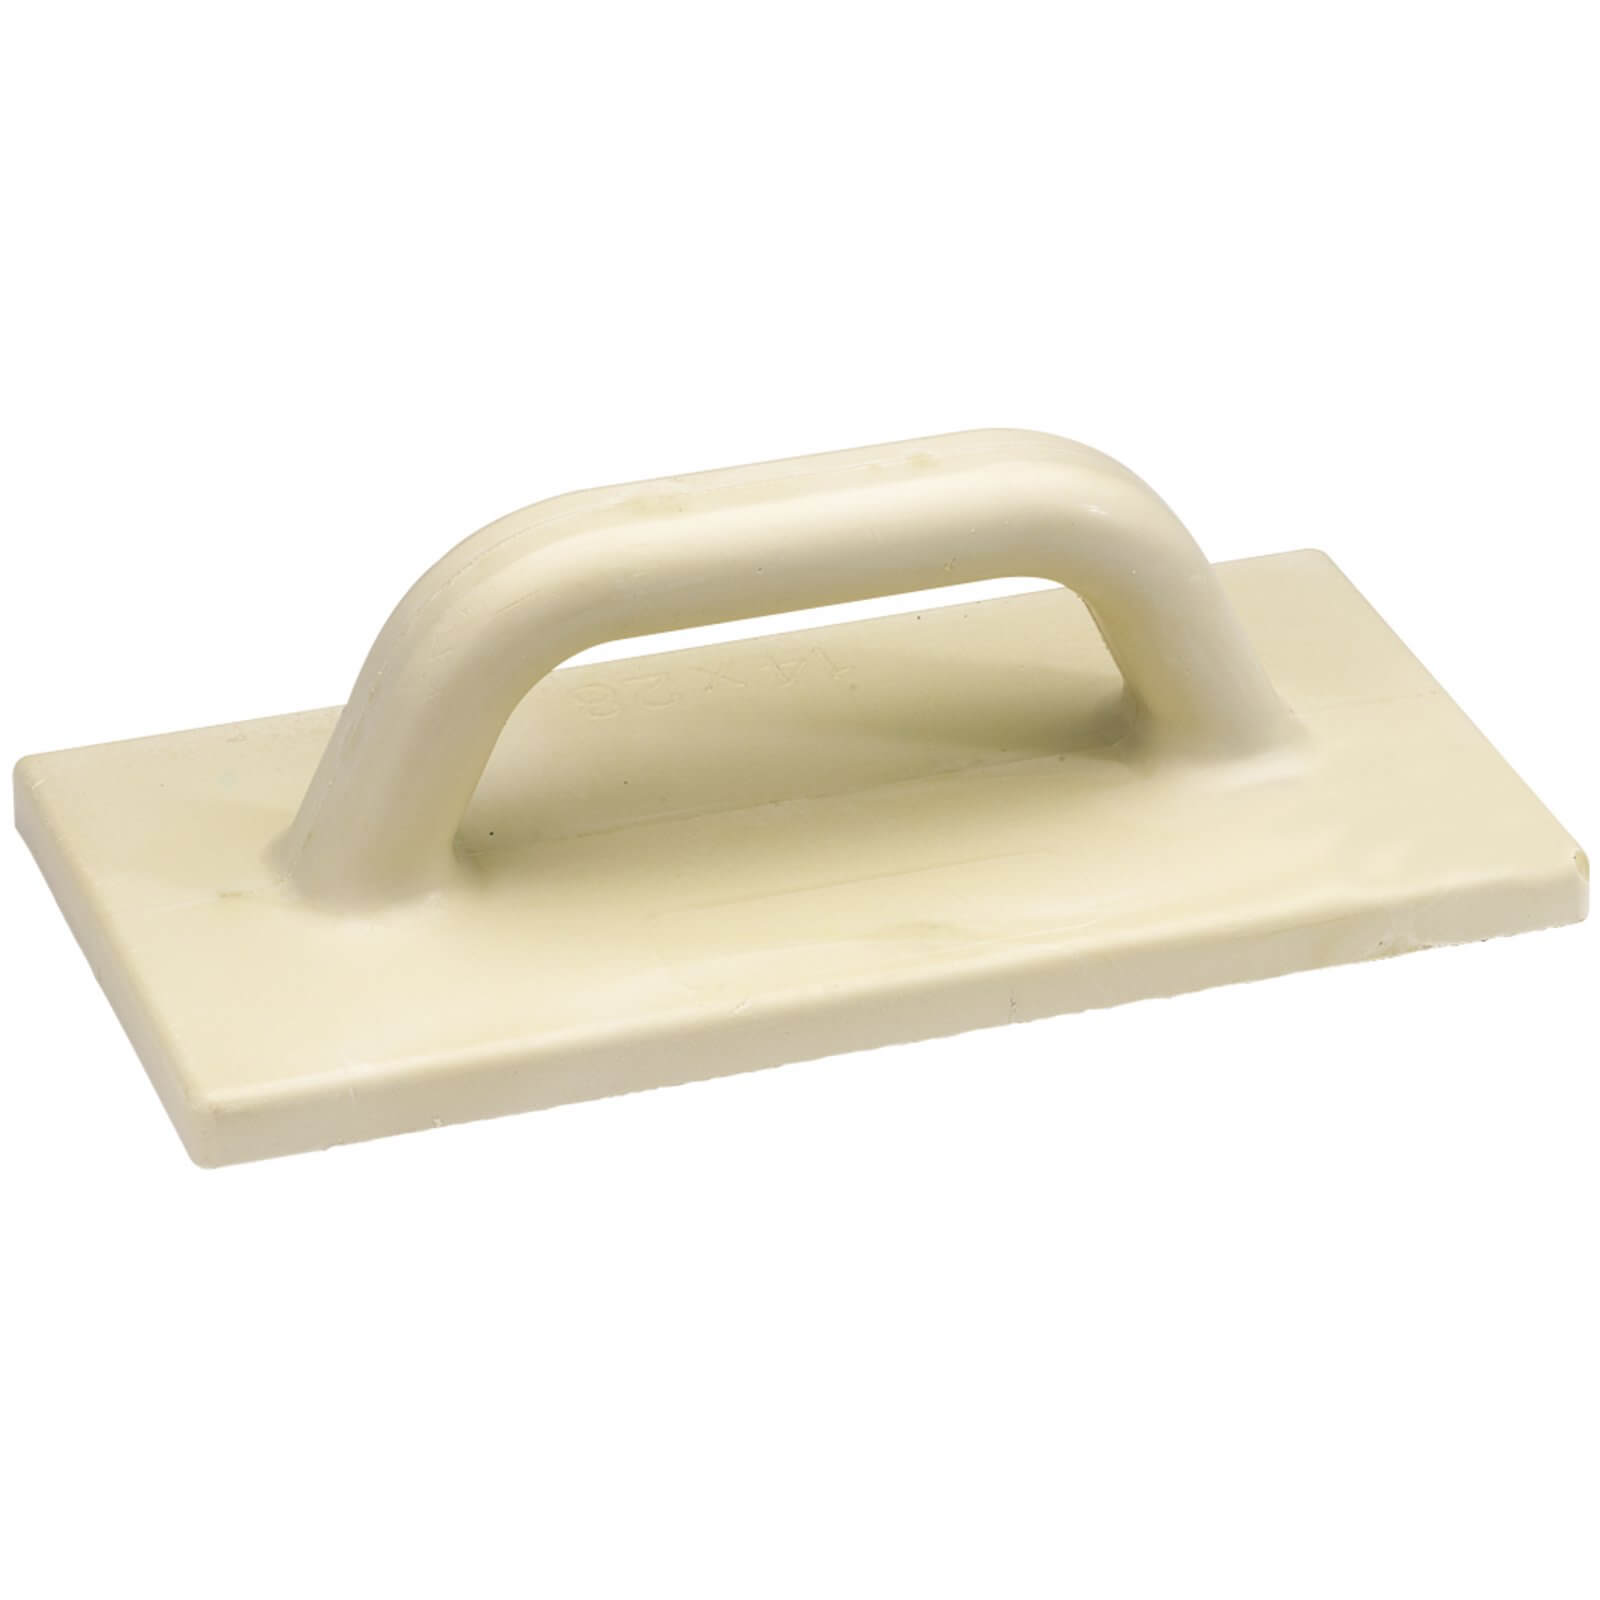 "Image of Draper Polyurethane Plasterers Float 11"" 5"" 1/2"""